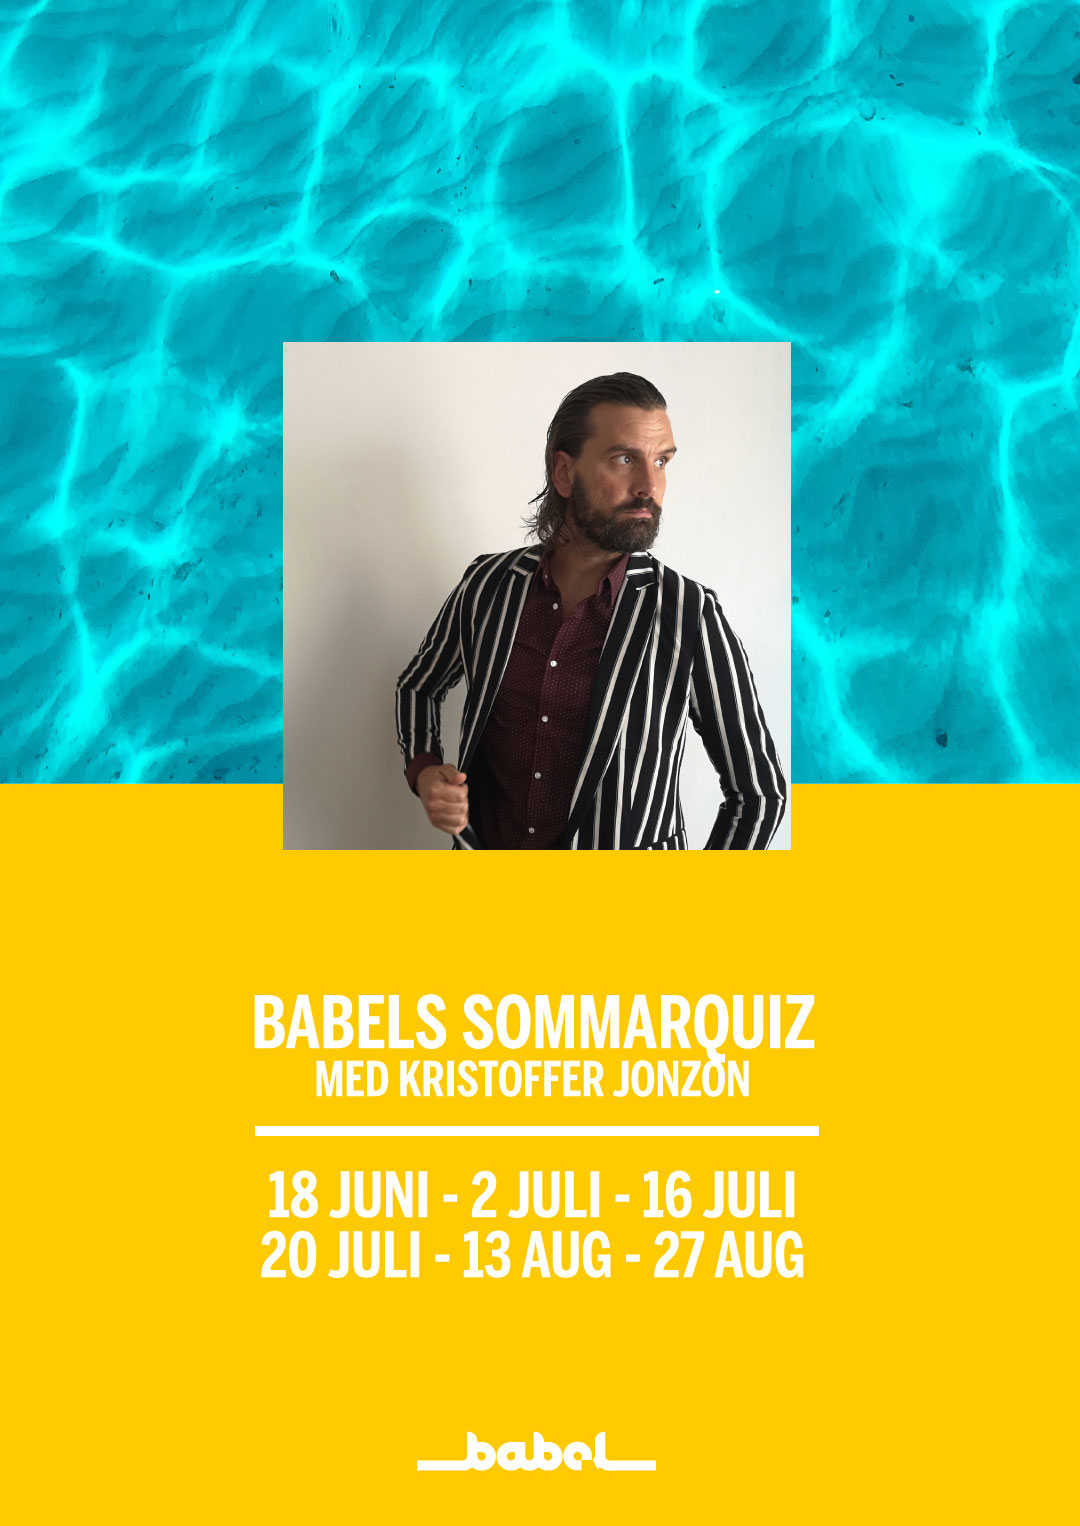 210730 : Babels Sommarquiz med Kristoffer Jonzon